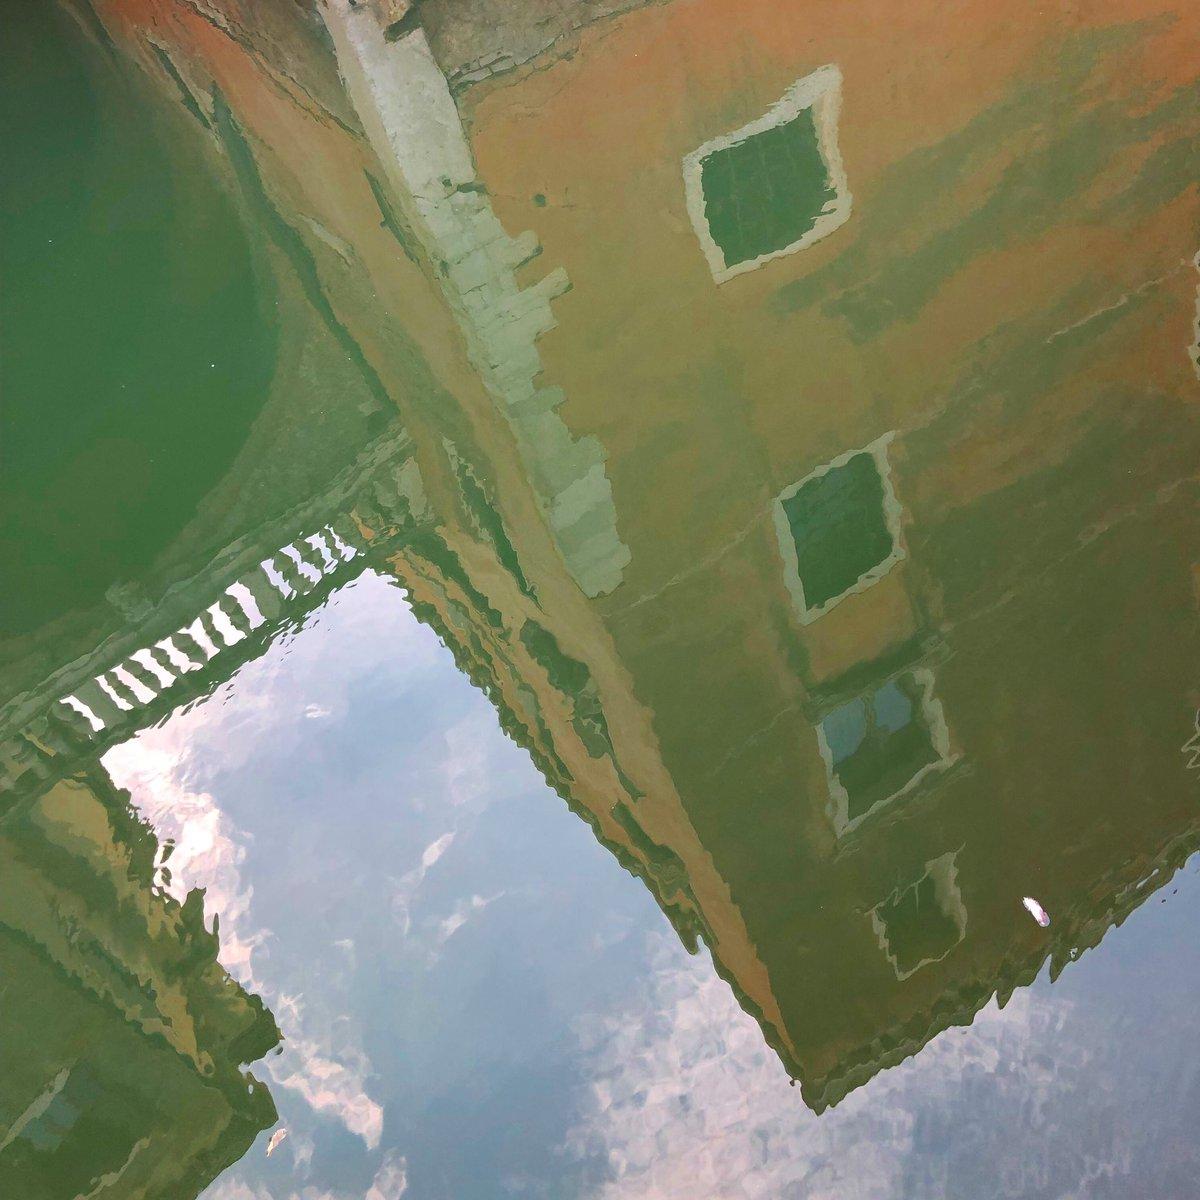 ig_bahrain_ on Twitter: #water #reflection #venice #italy #photography #photooftheday #PhotographyIsArt #photographers #photographyislife #myphoto…